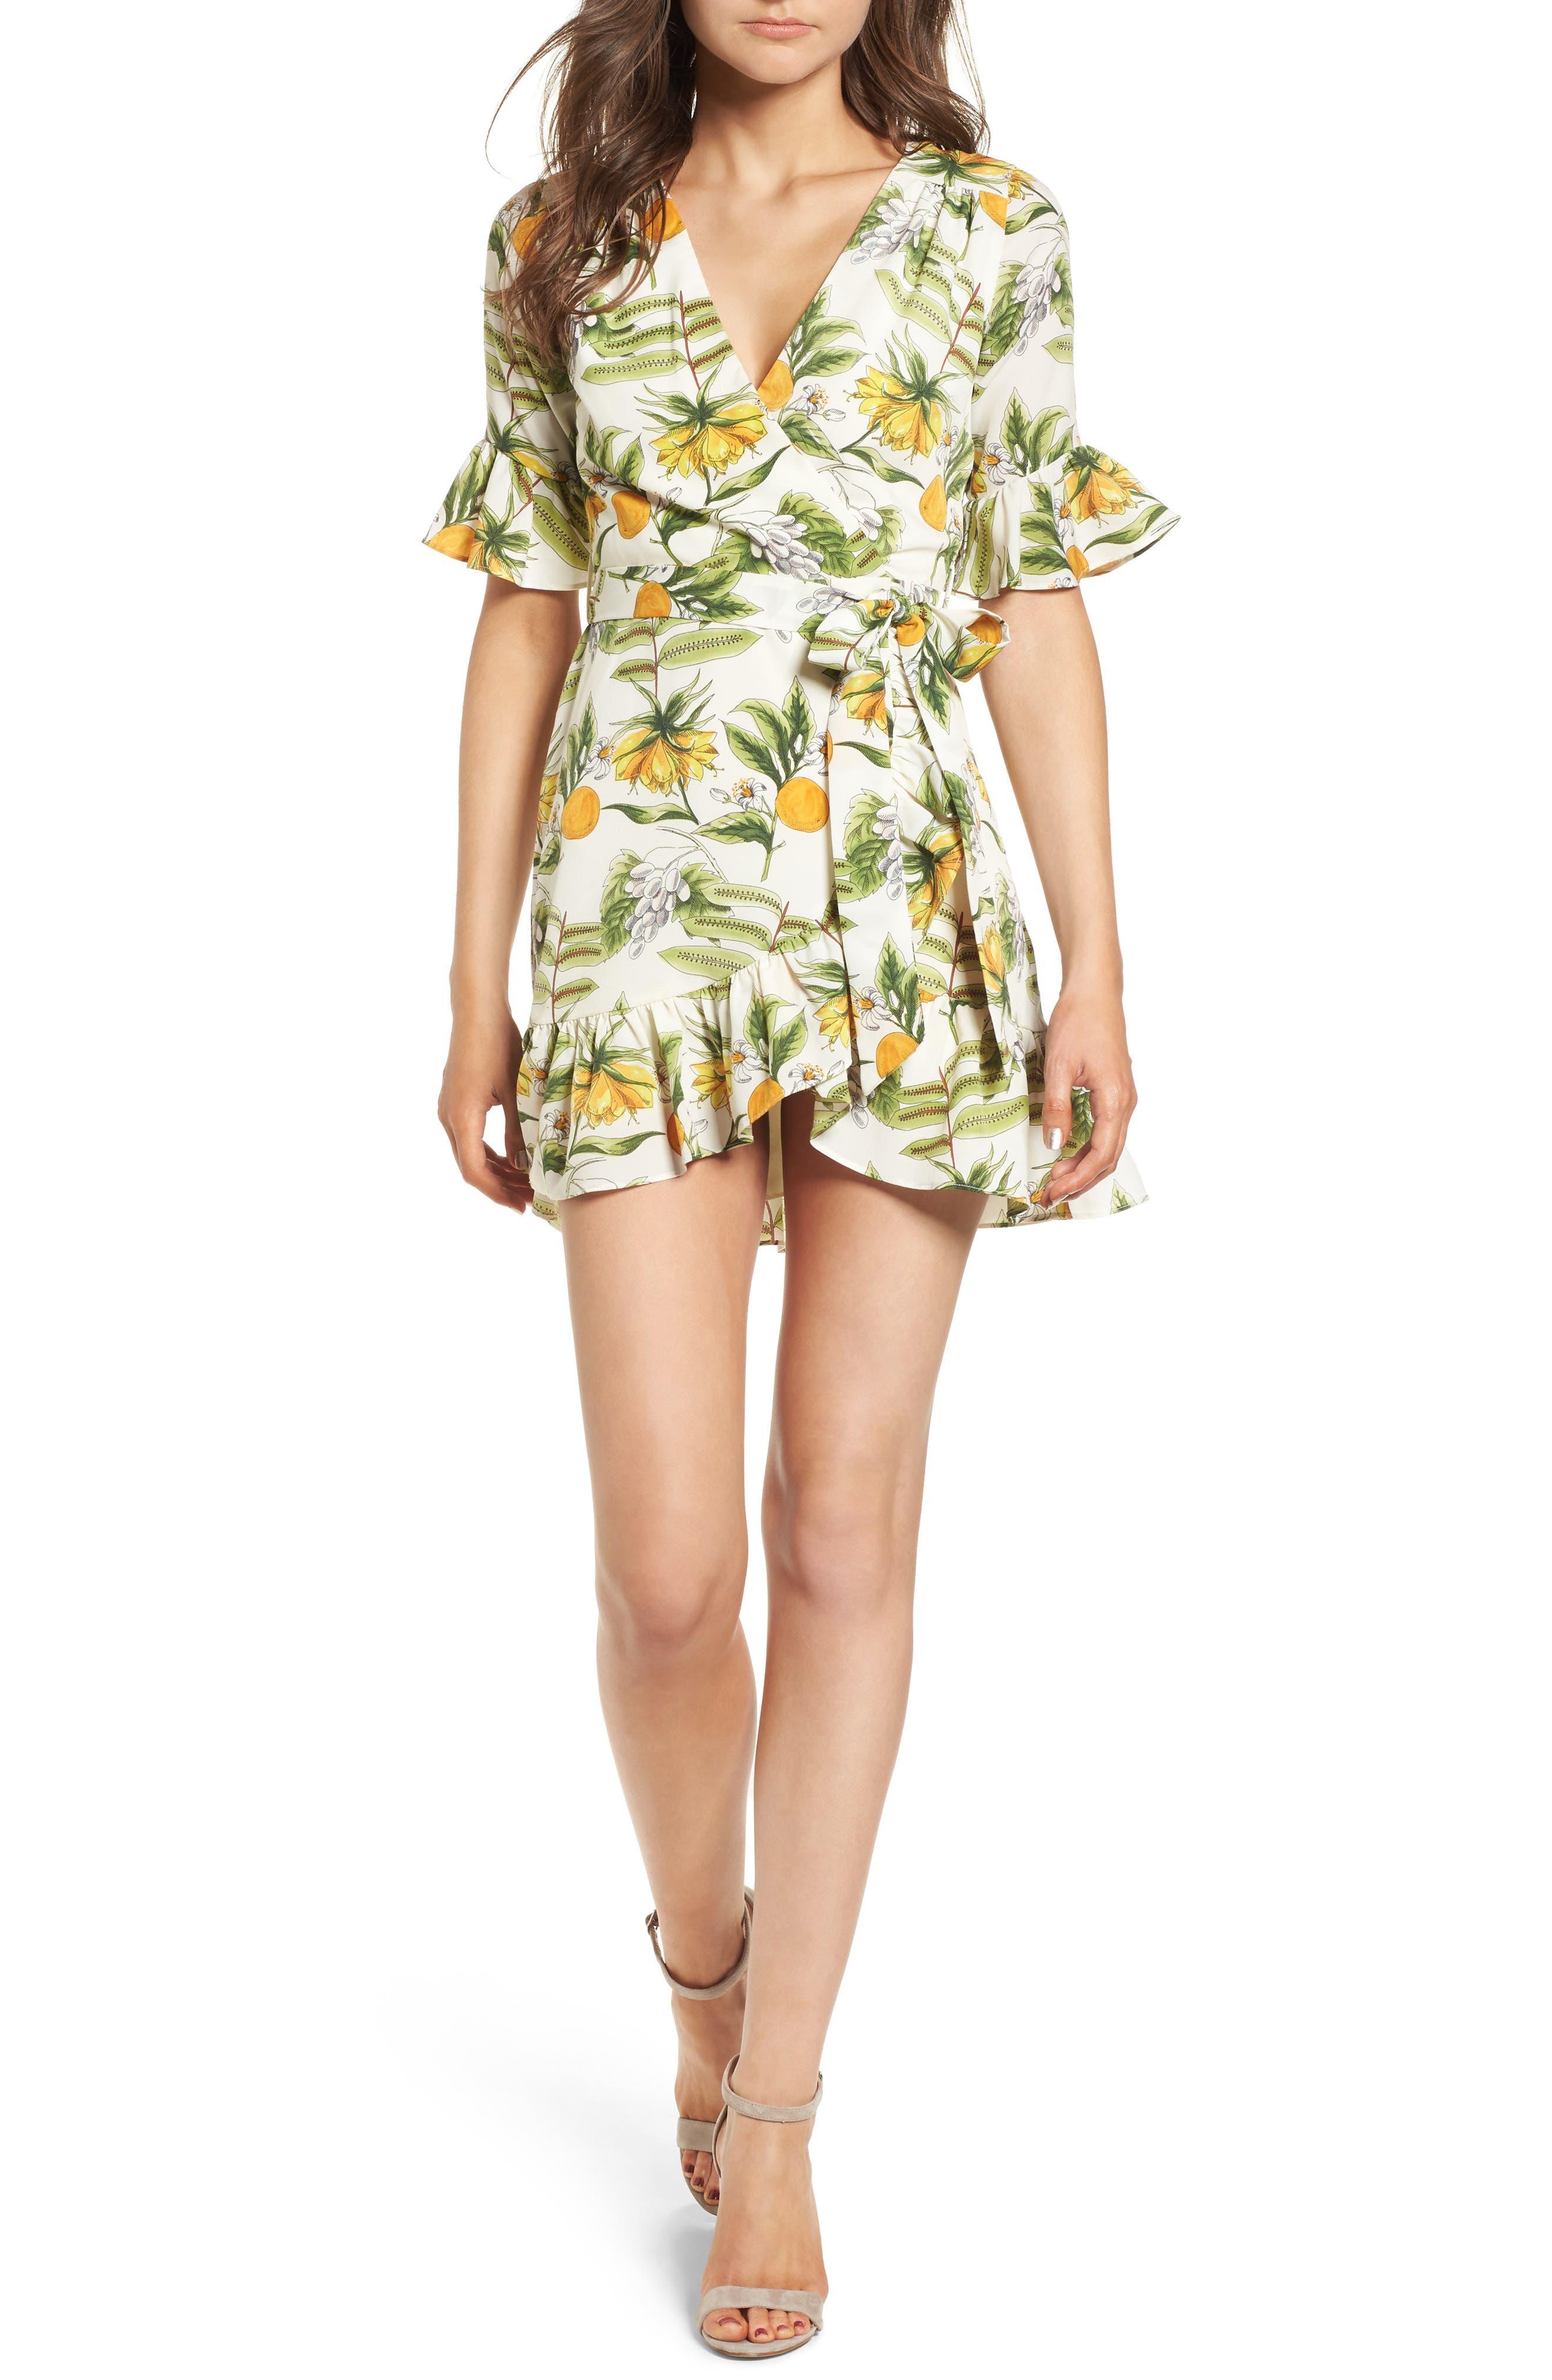 Limonada Citrus Dress,                             Main thumbnail 1, color,                             IVORY/ YELLOW